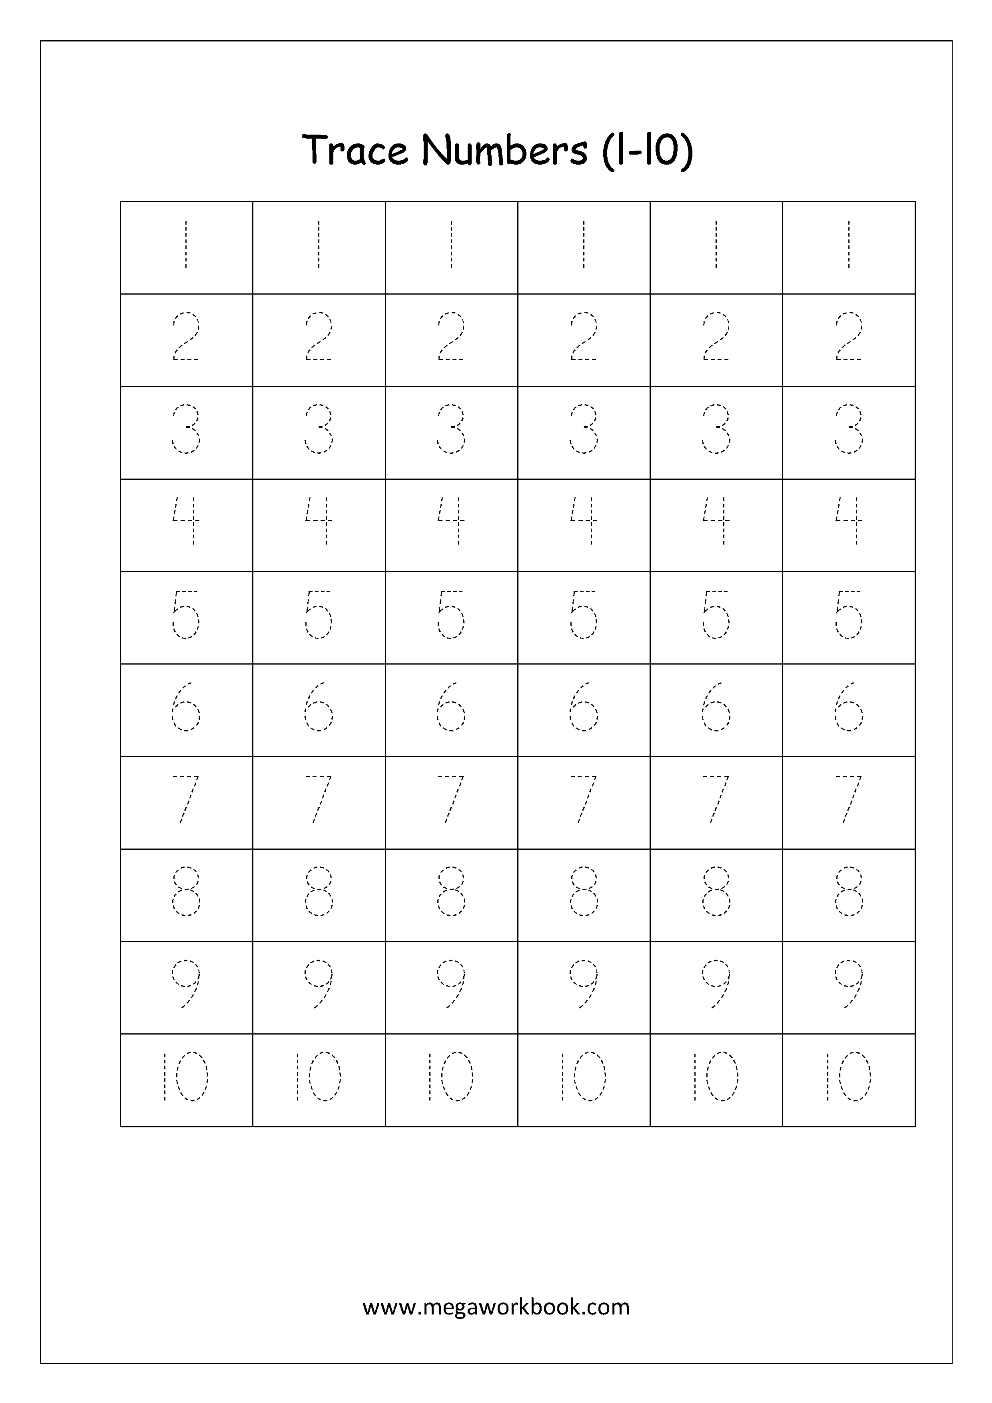 Number 1 Worksheets Site Pinterest Com For You Number 1 Worksheets Math Free Preschool Worksheets Writing Practice Kindergarten Free Kindergarten Worksheets [ 1403 x 992 Pixel ]